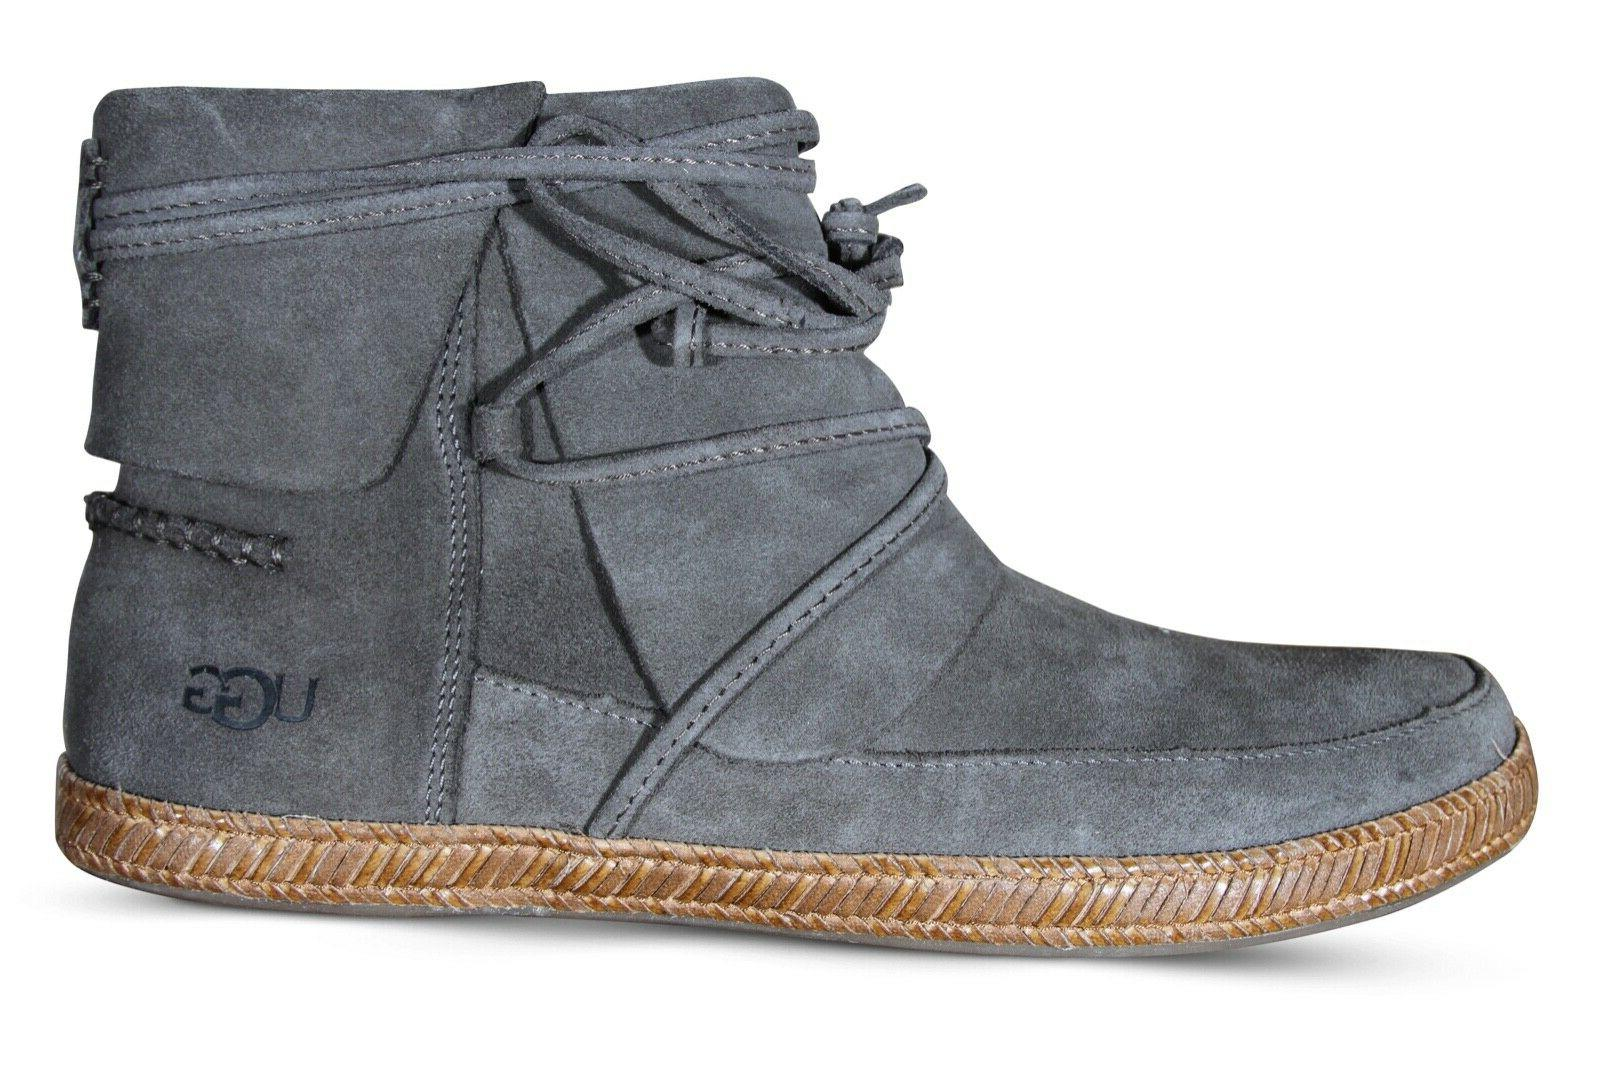 UGG Australia Womens Boots Slate